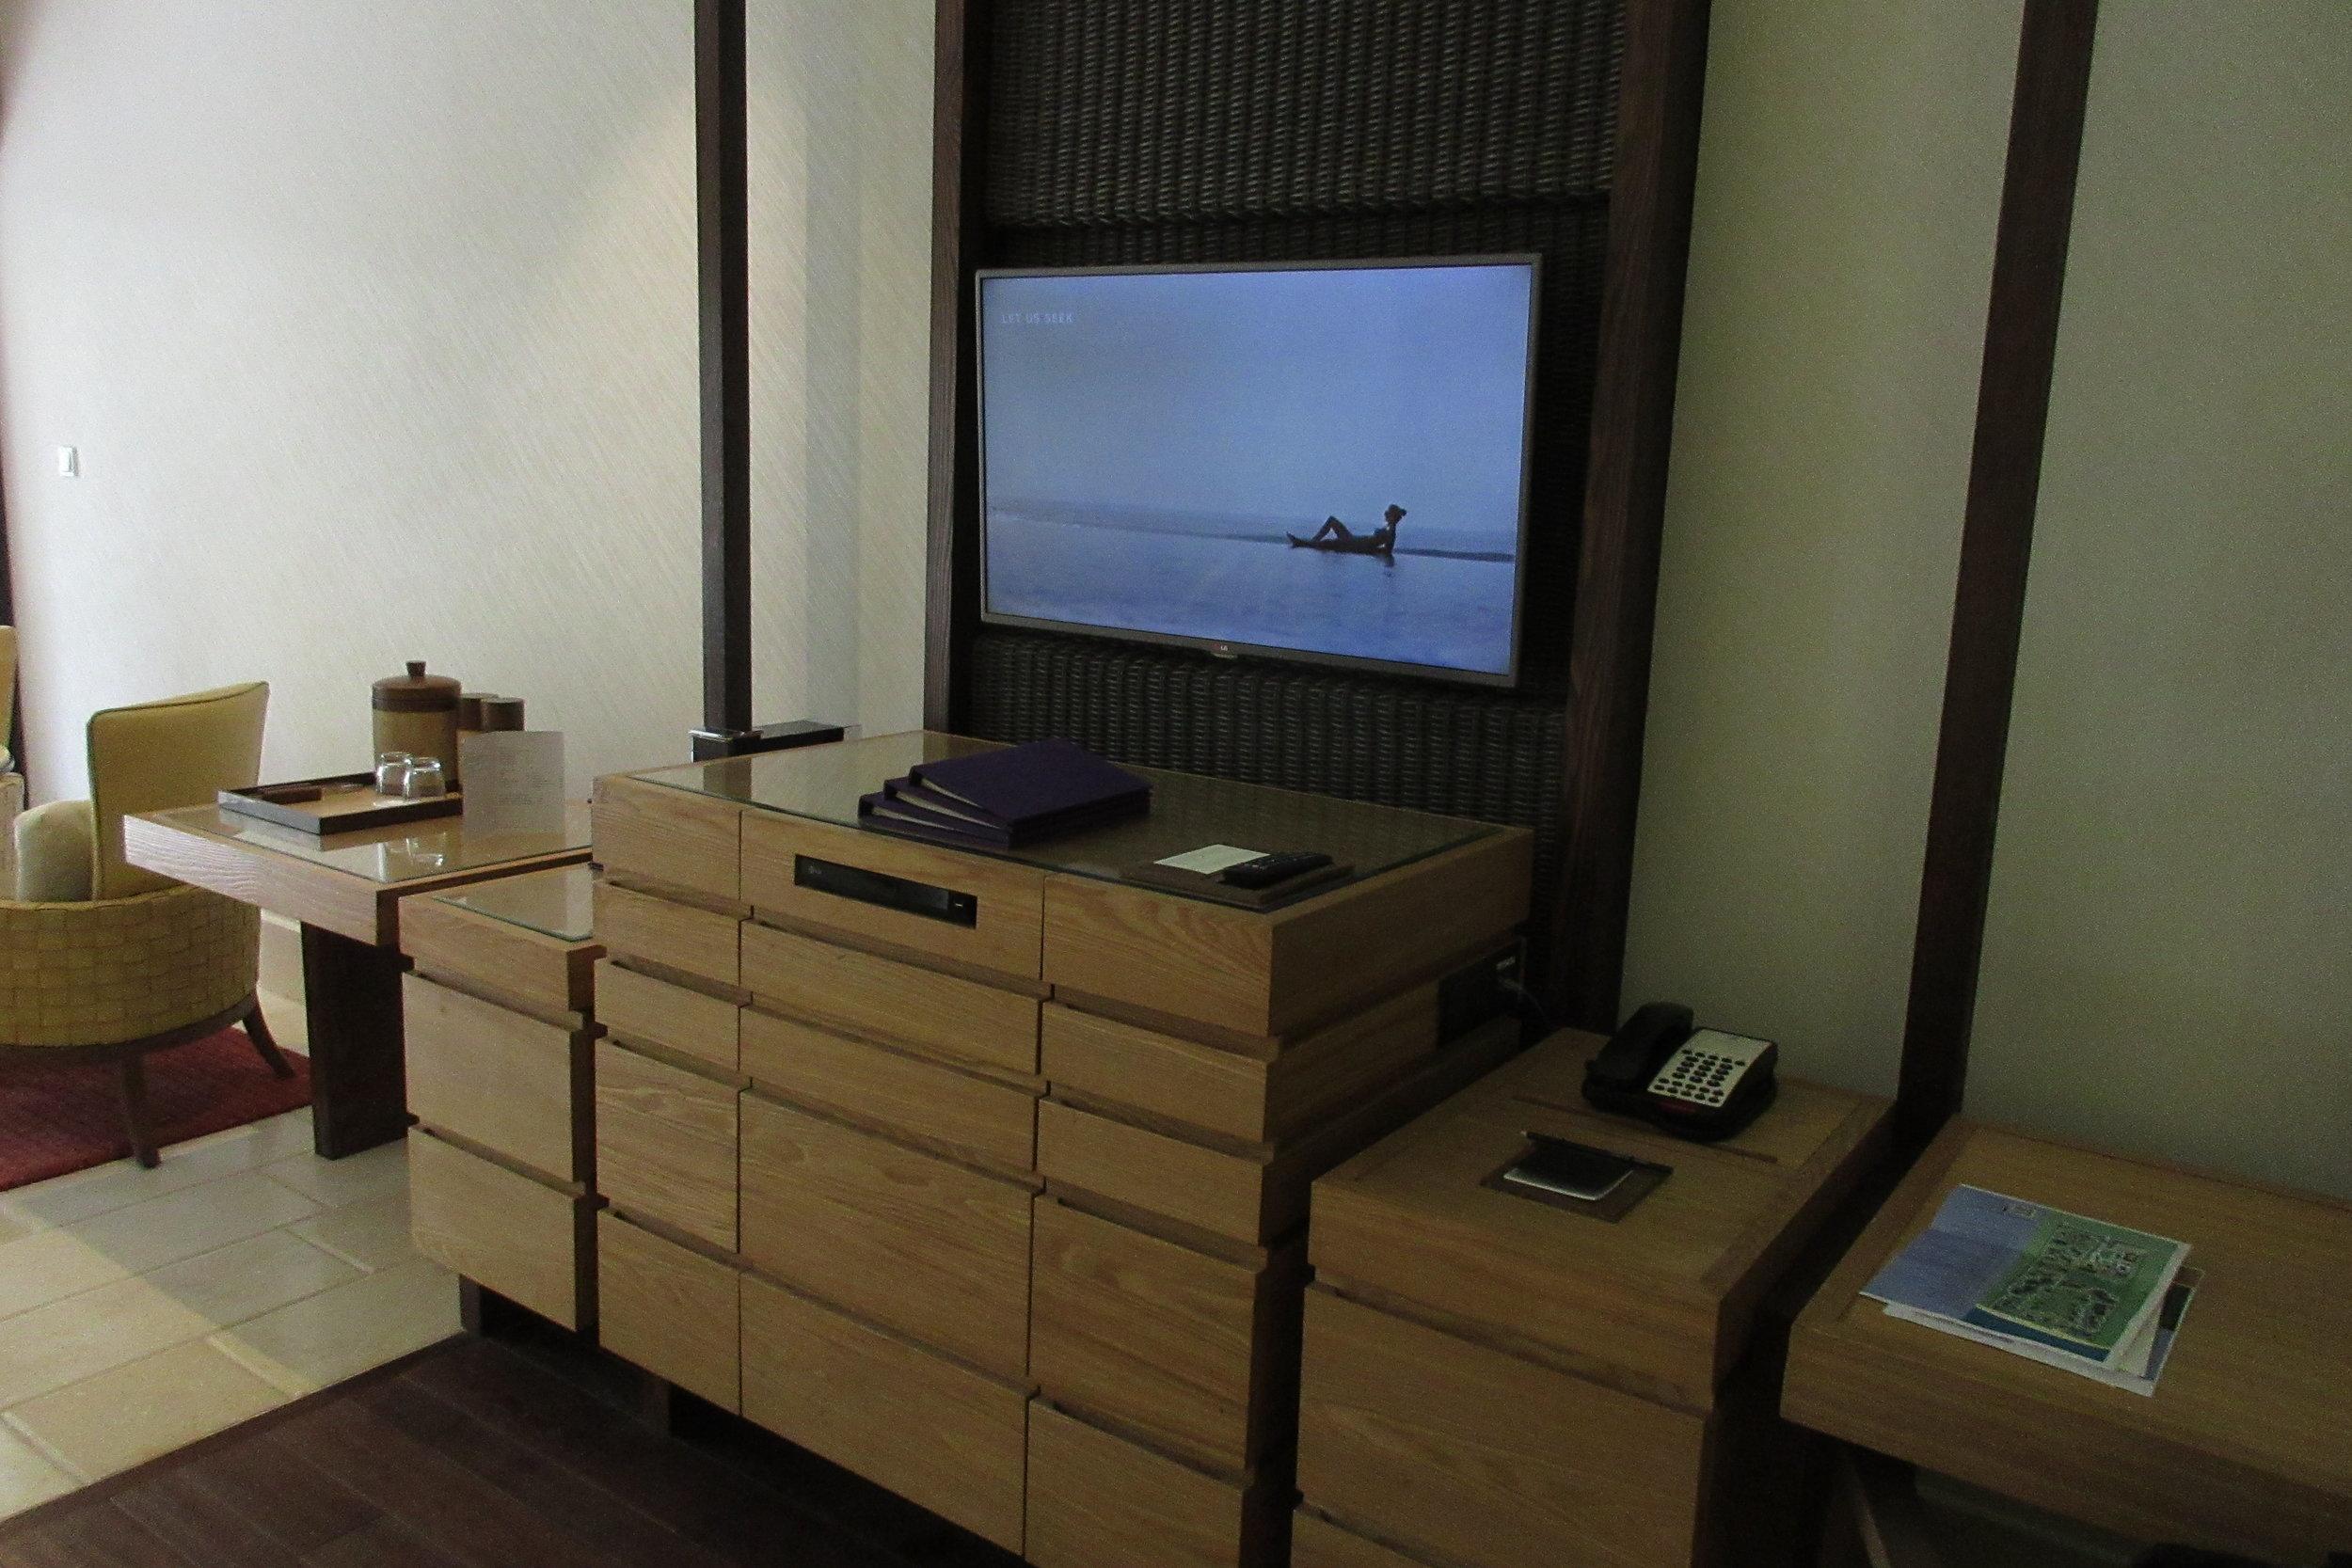 The Ritz-Carlton, Bali – Television